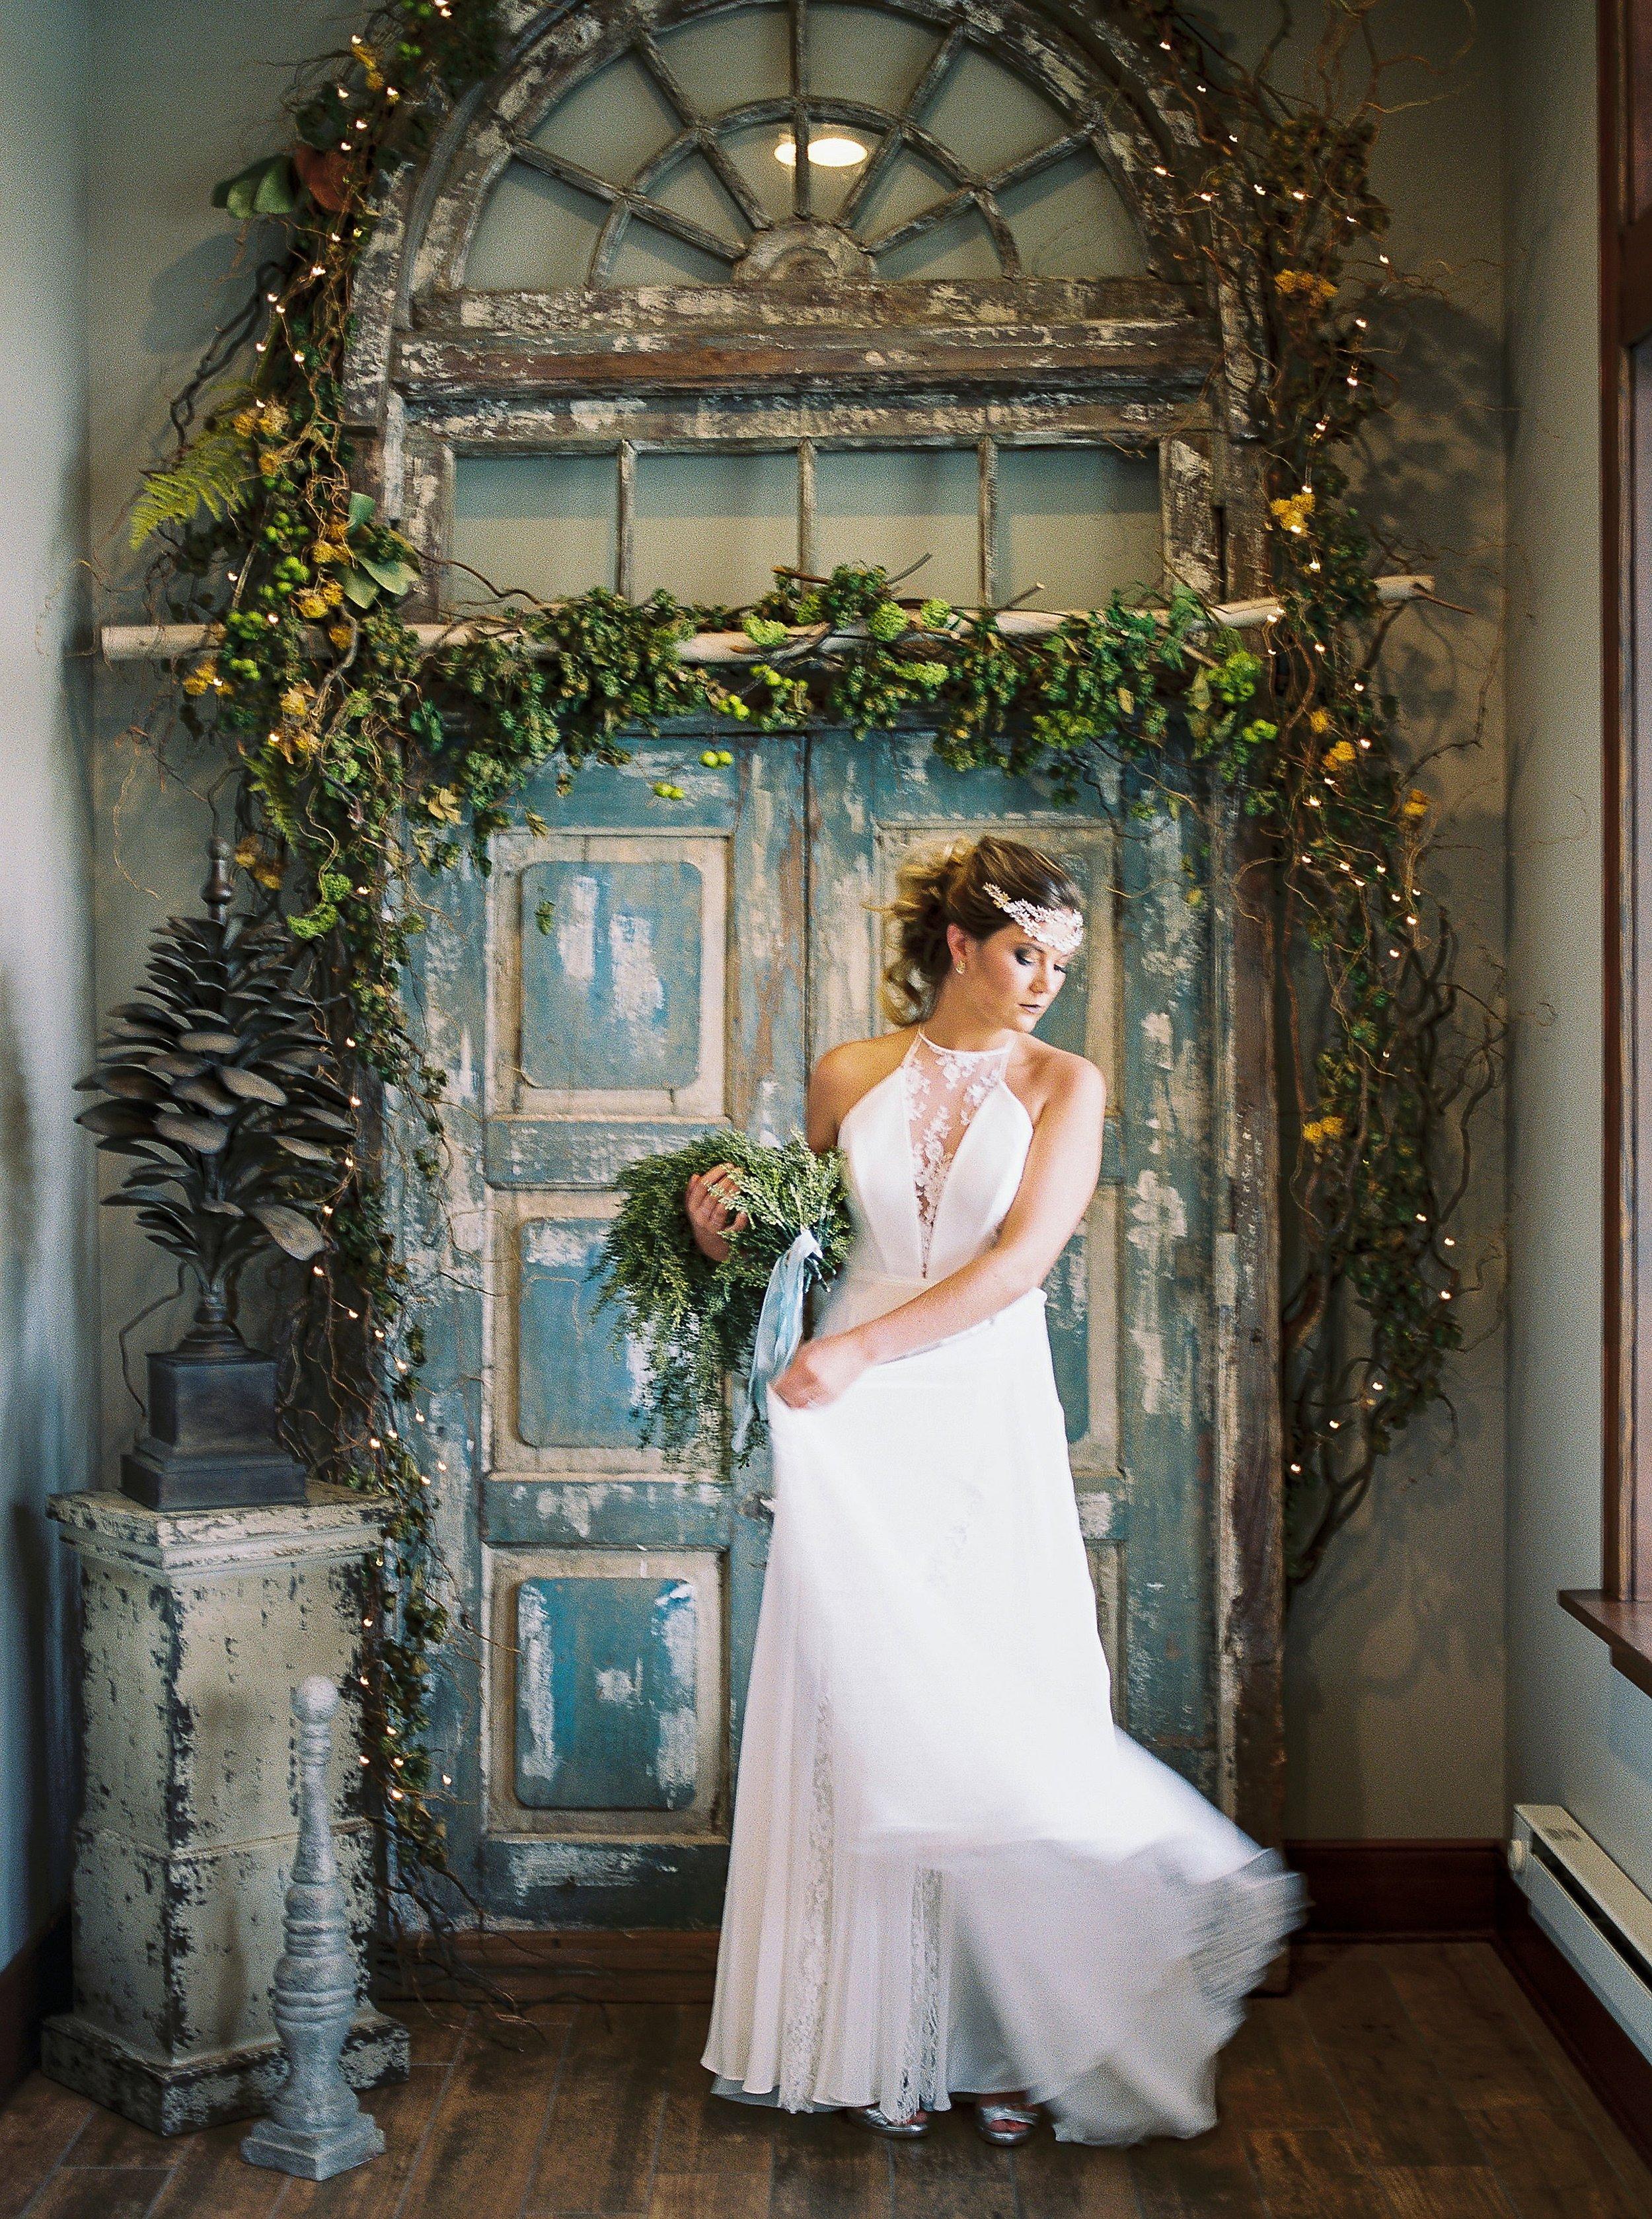 Alexandra-Elise-Photography-Ali-Reed-Film-Wedding-Photographer-Deerfield-Country-Club-128.jpg